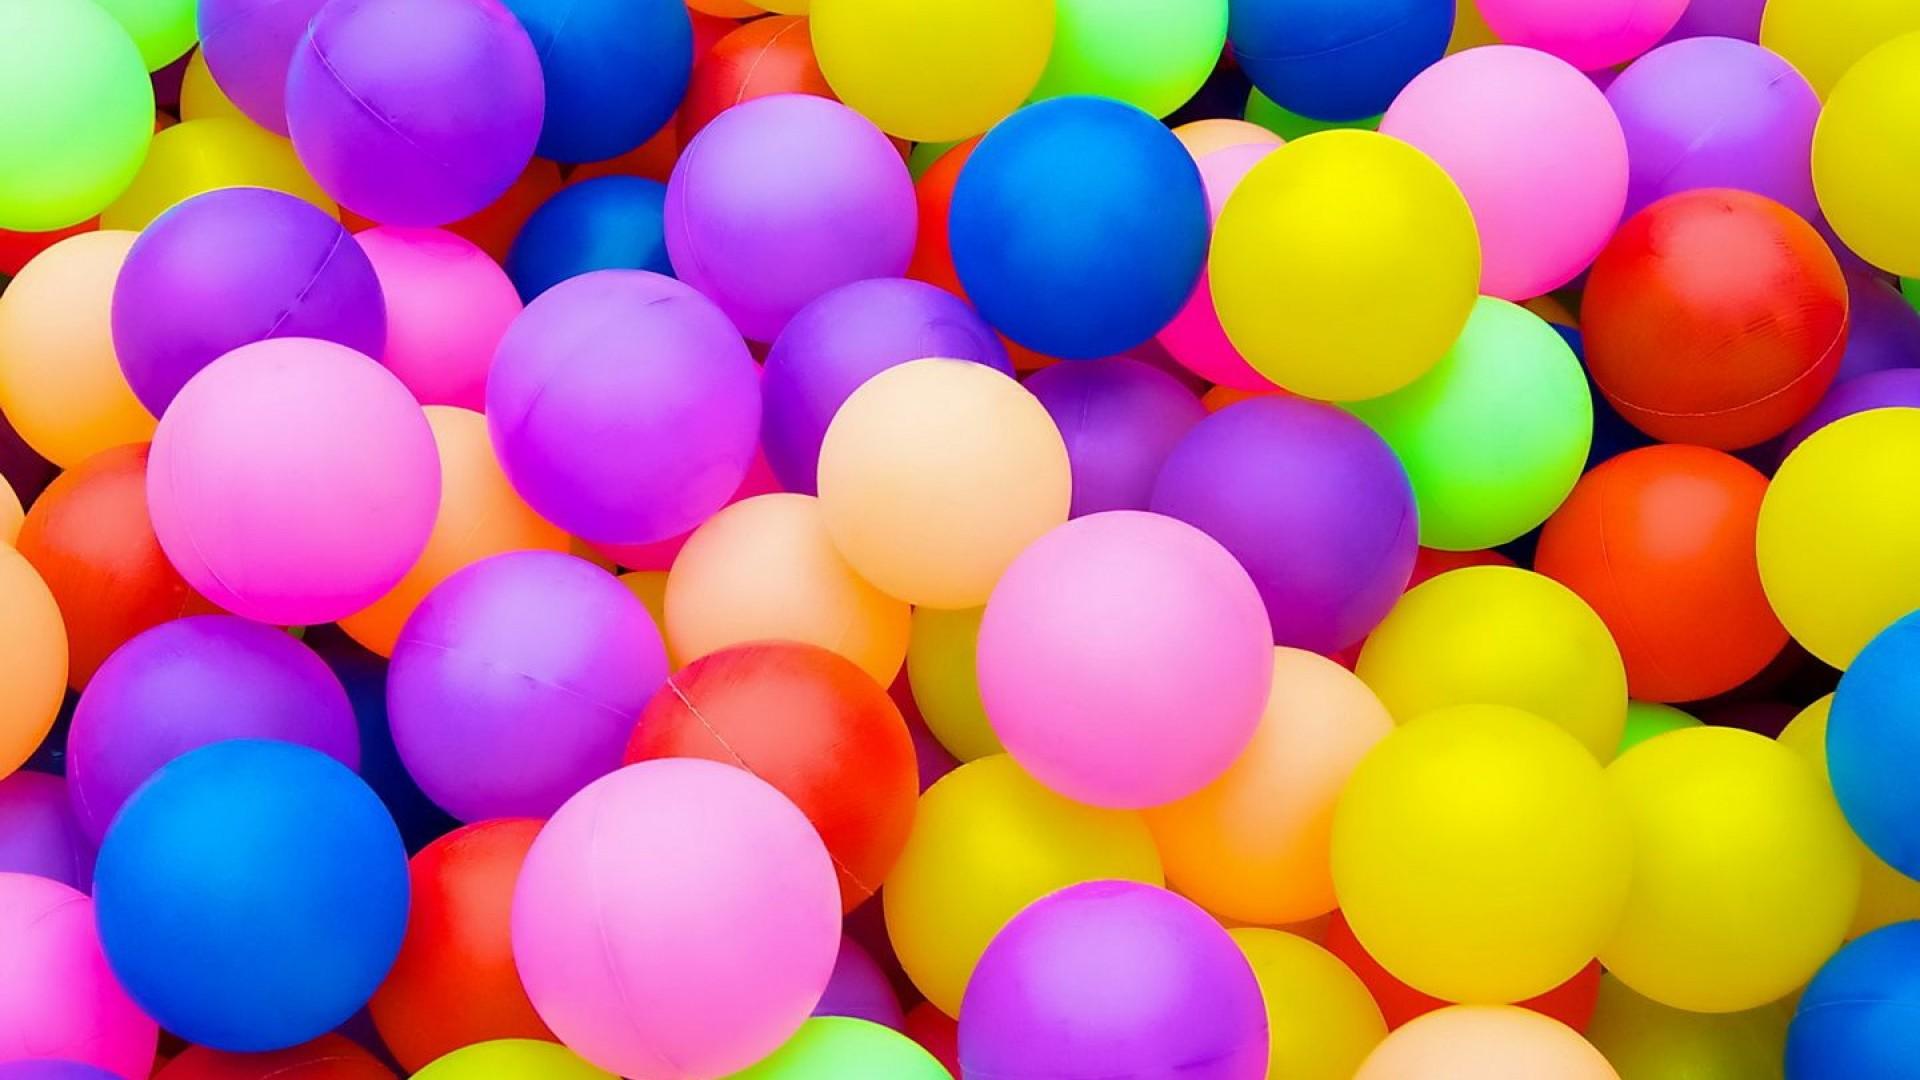 Birthday Balloons Wallpaper